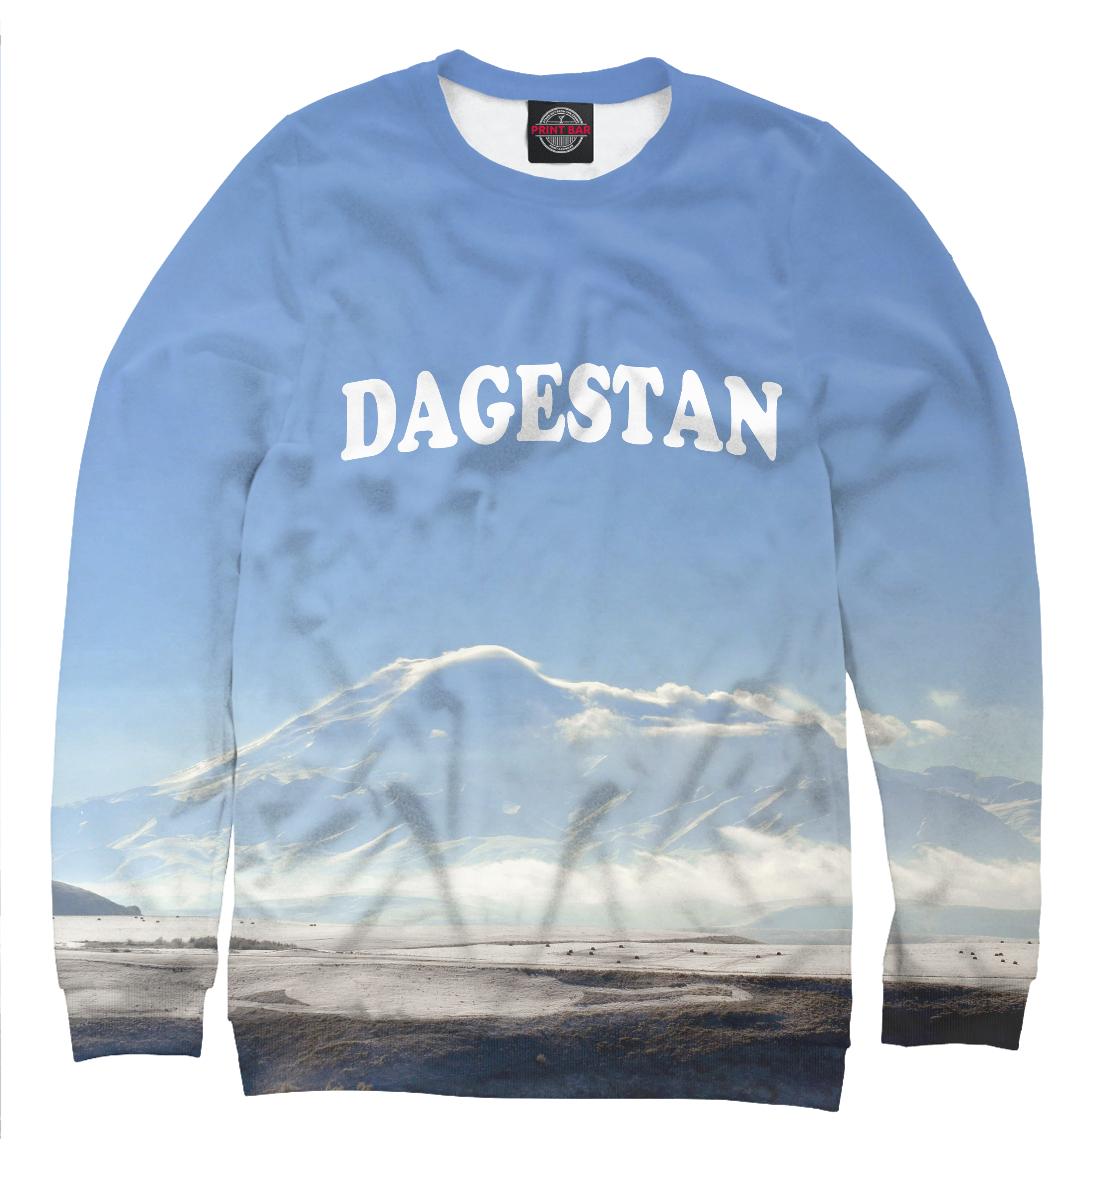 Купить Дагестан, Printbar, Свитшоты, VSY-253924-swi-2